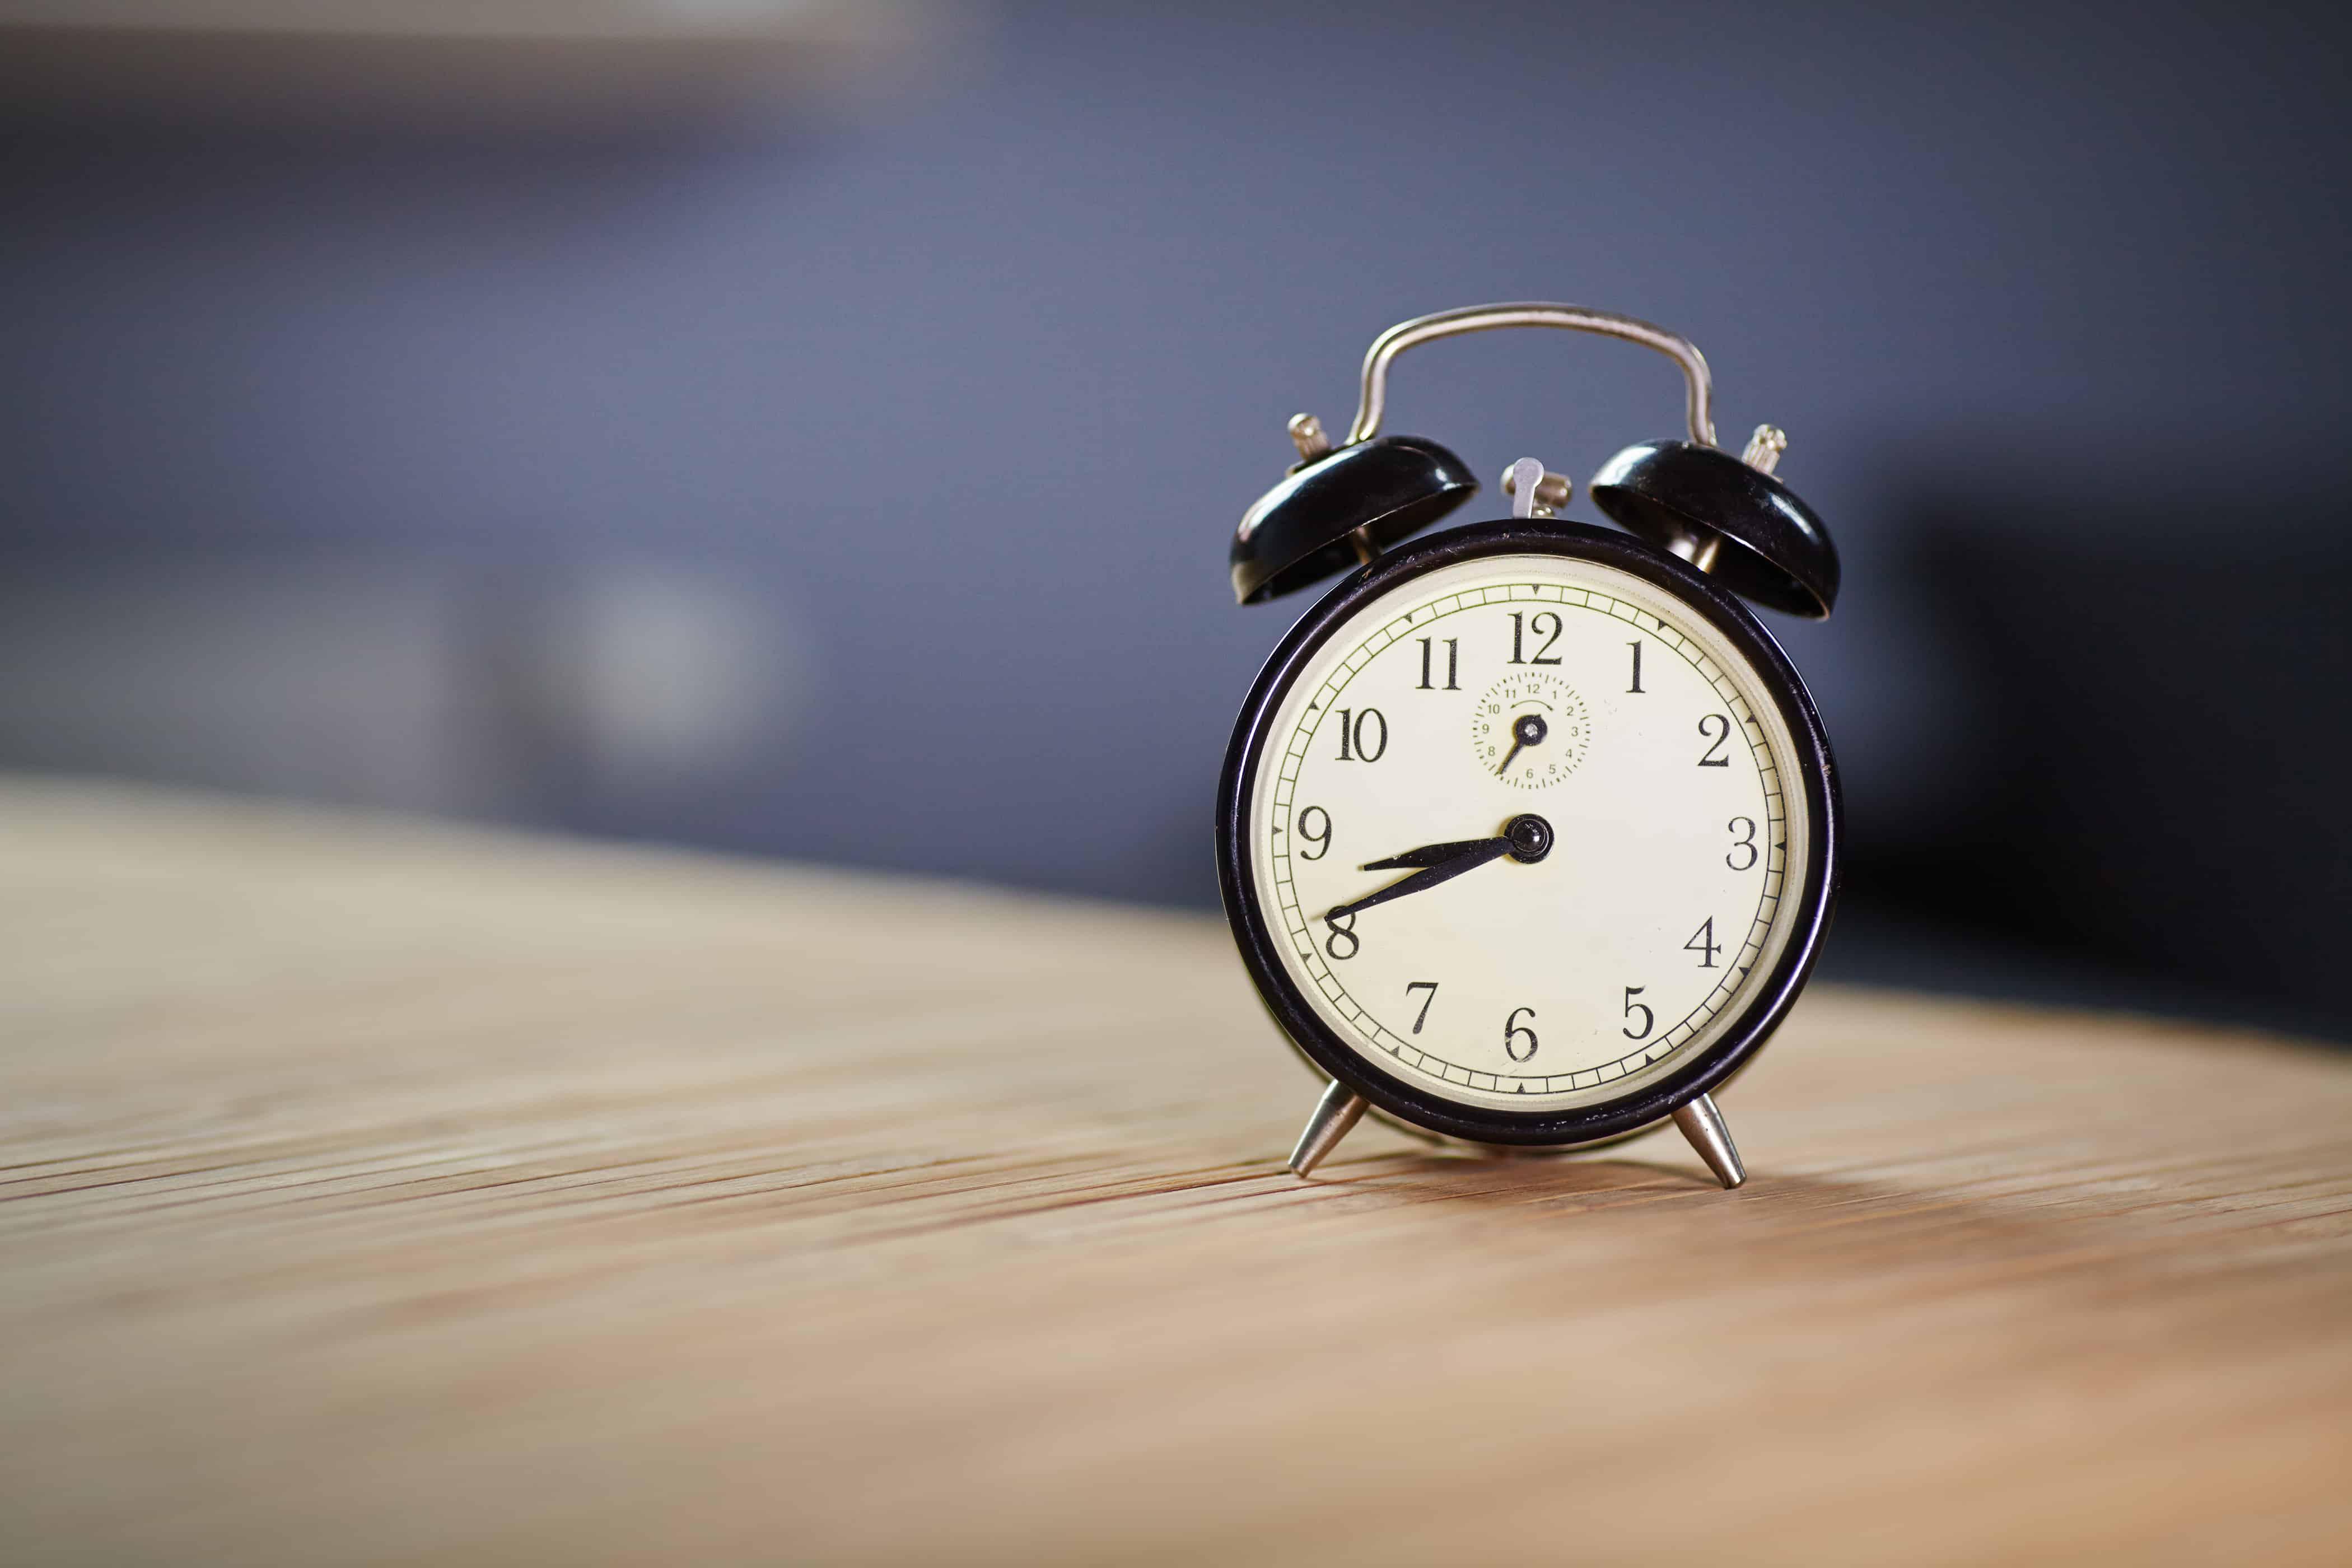 Retro alarm clock on desk front grey wall background